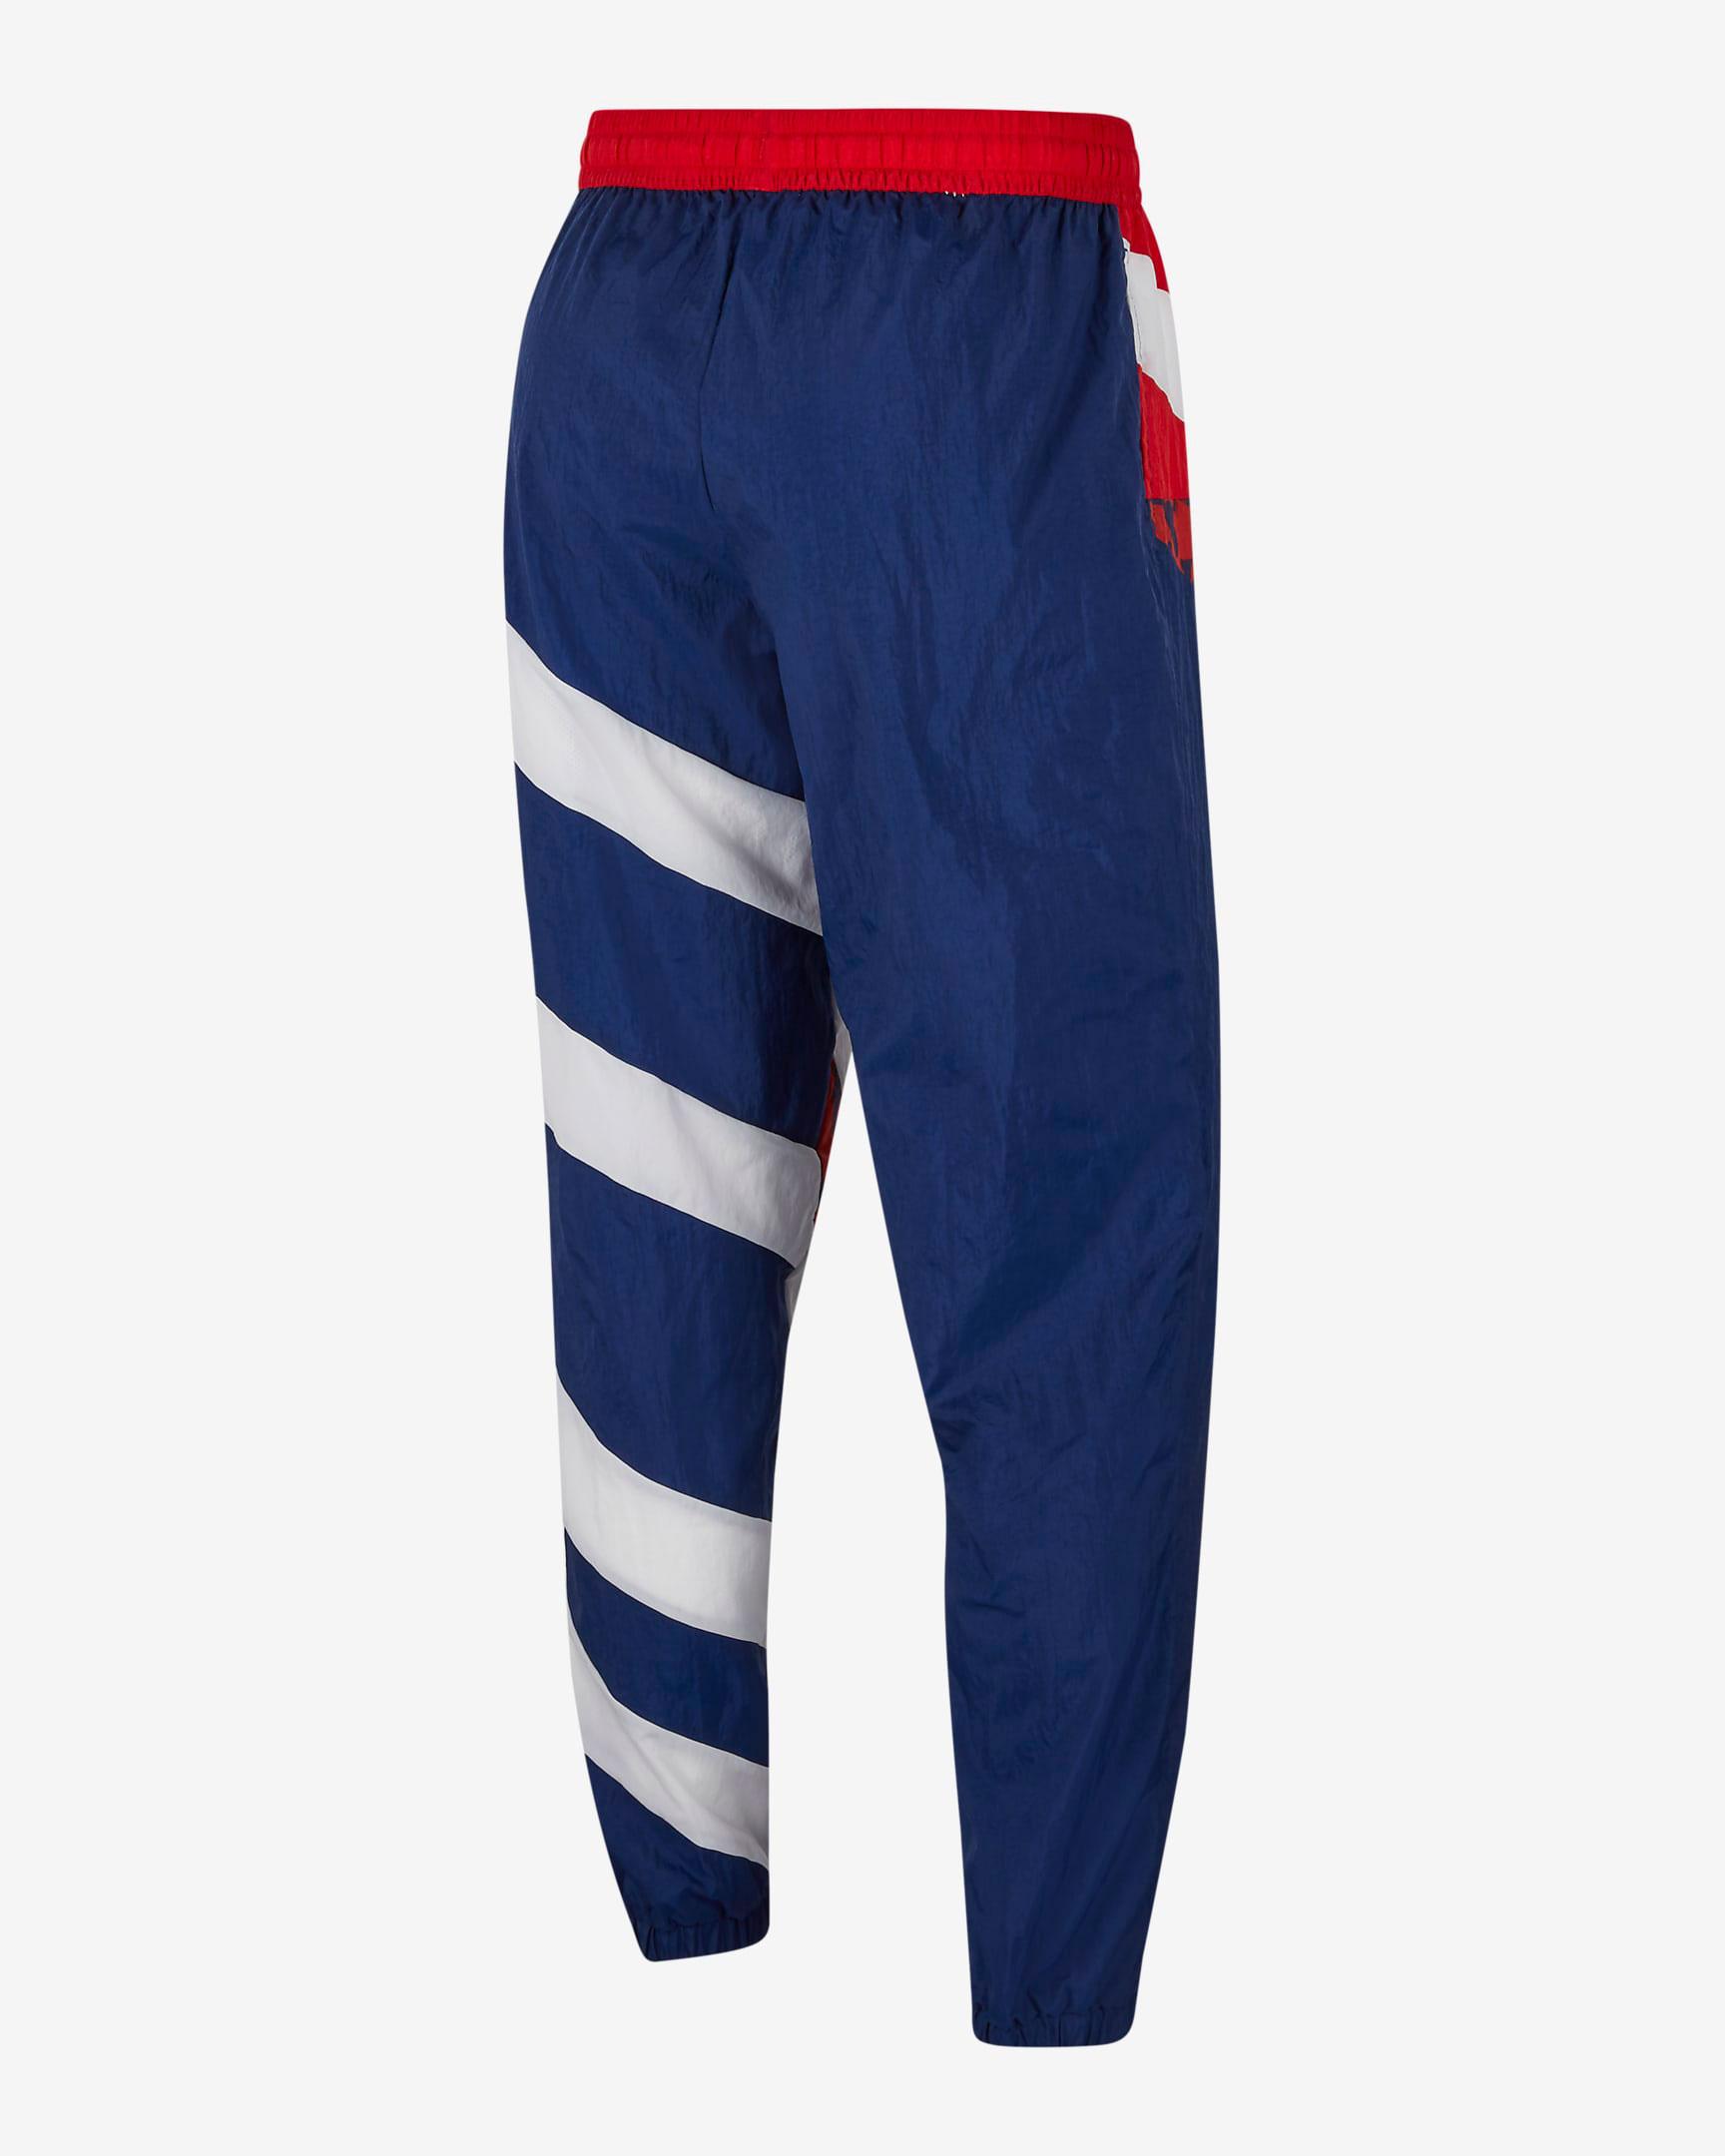 nike-kybrid-usa-pants-2